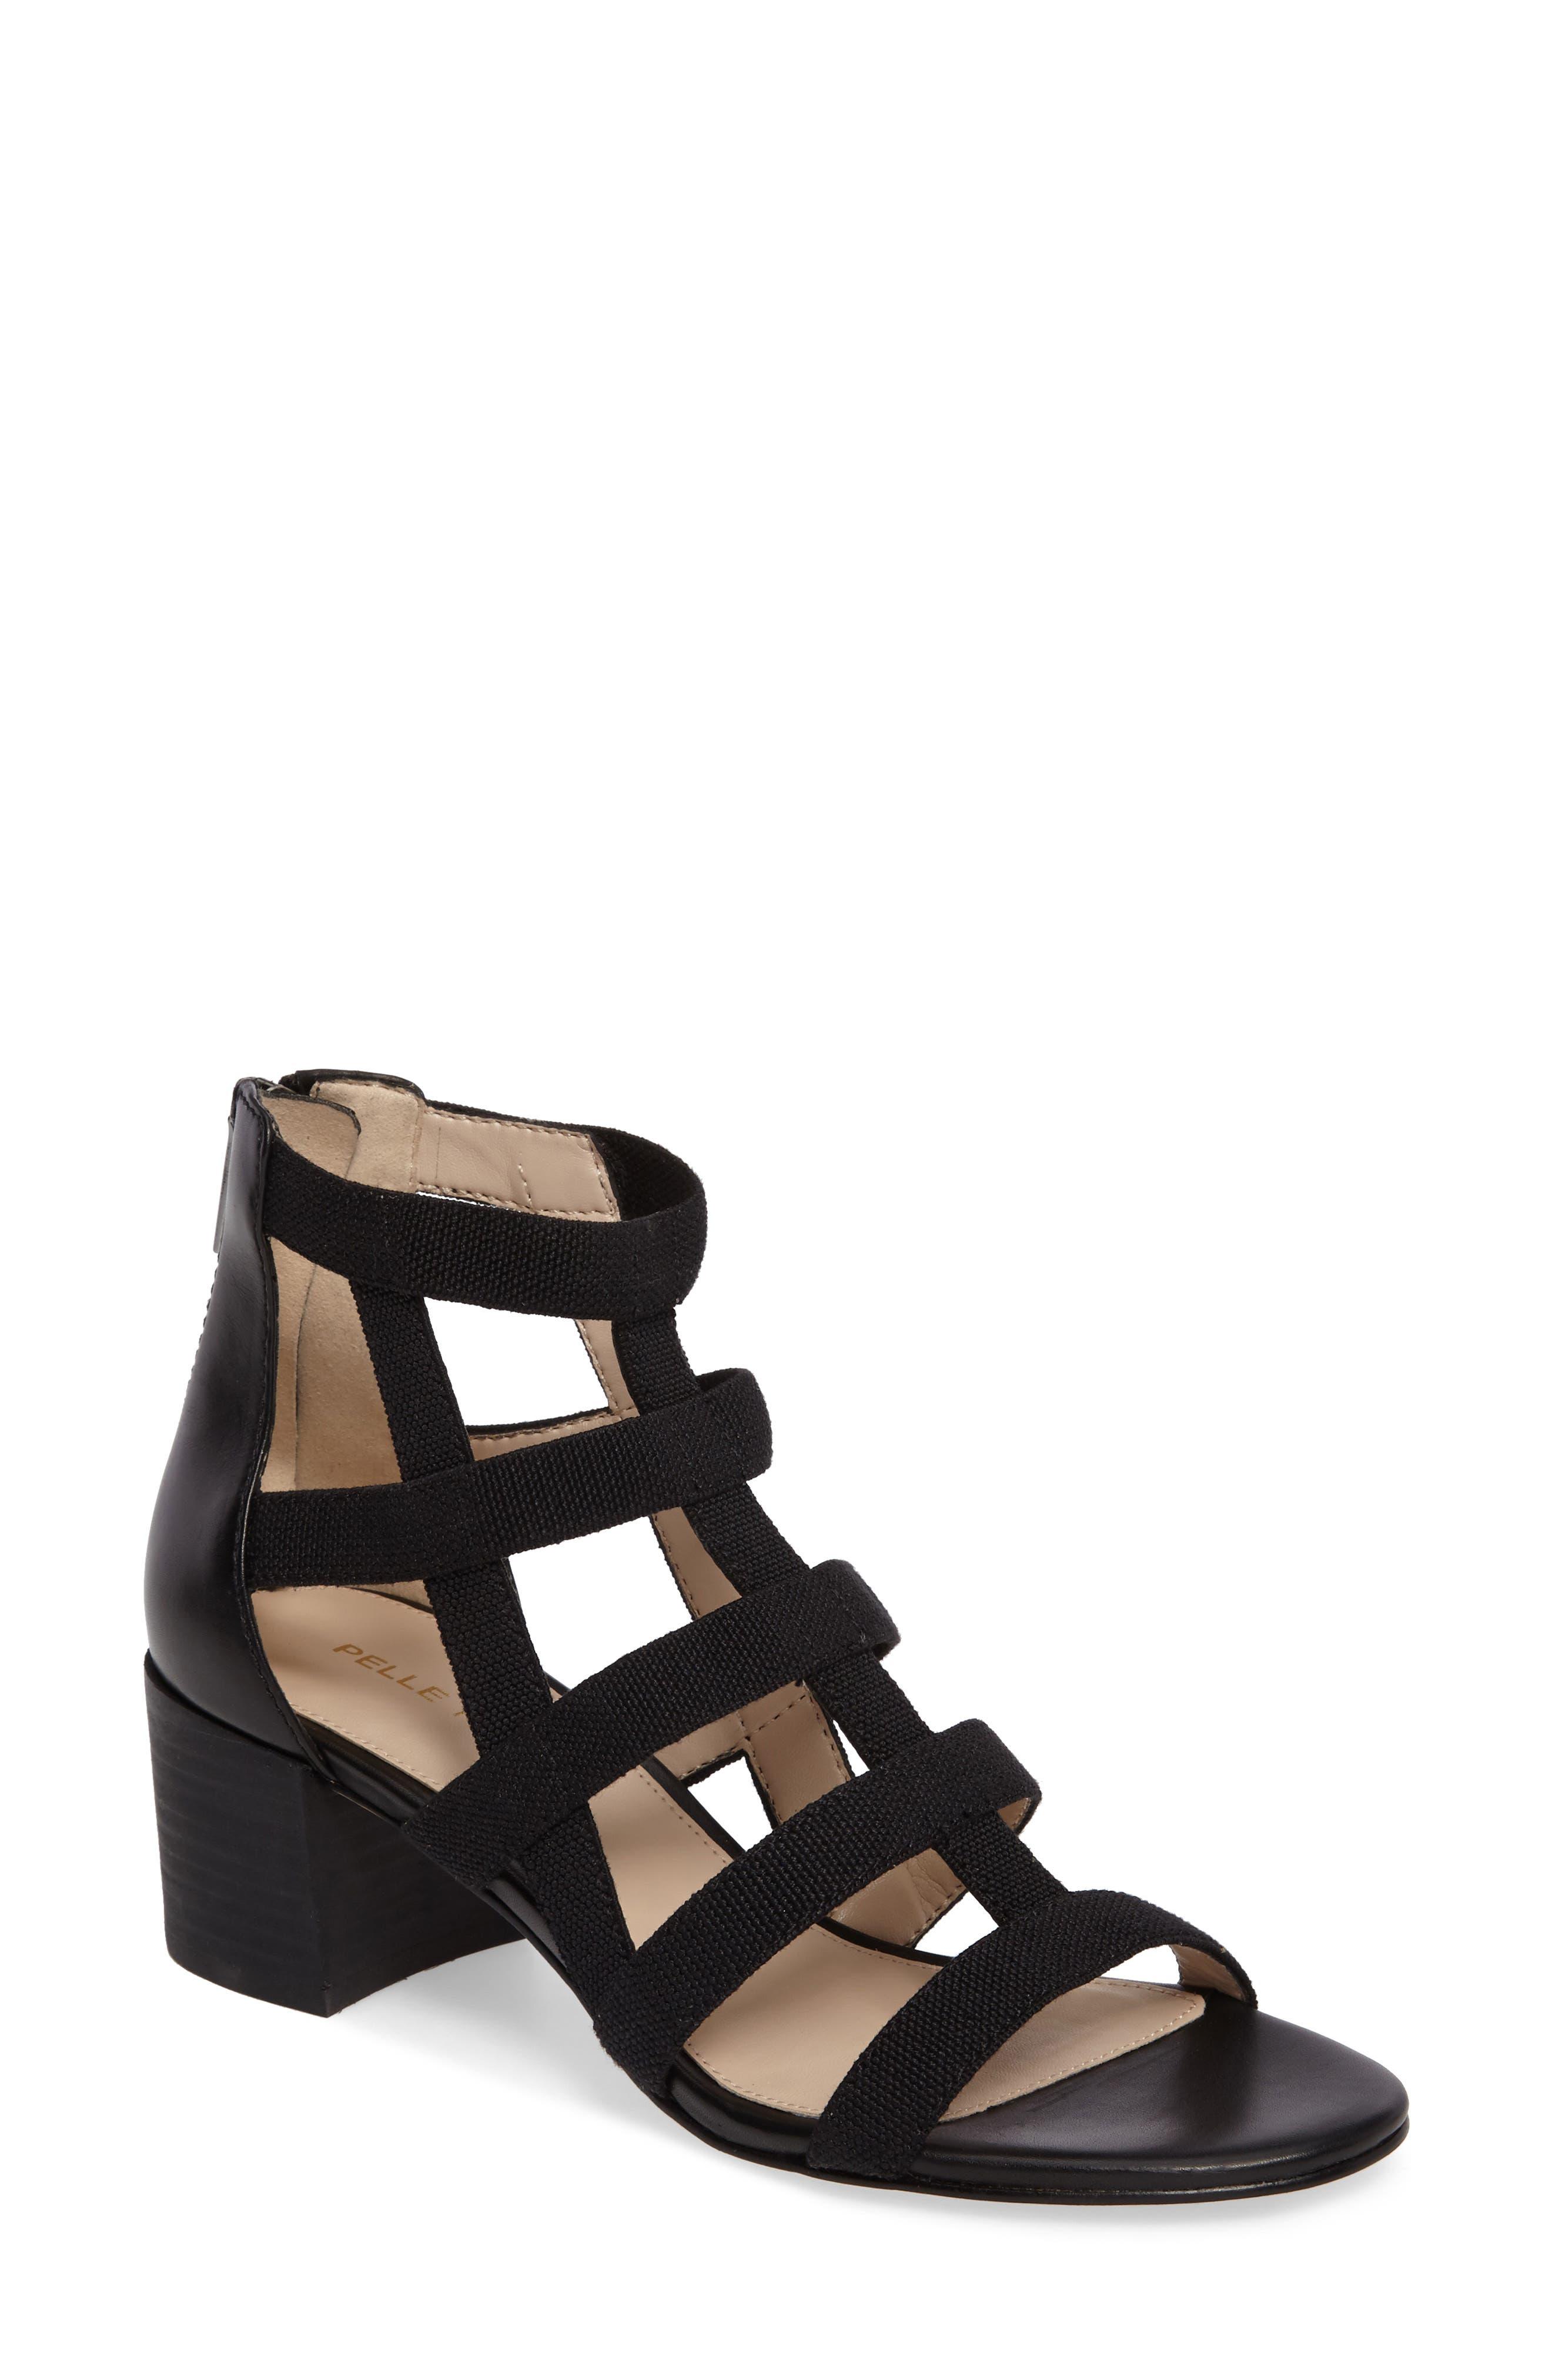 Unkar Block Heel Sandal,                         Main,                         color, 001